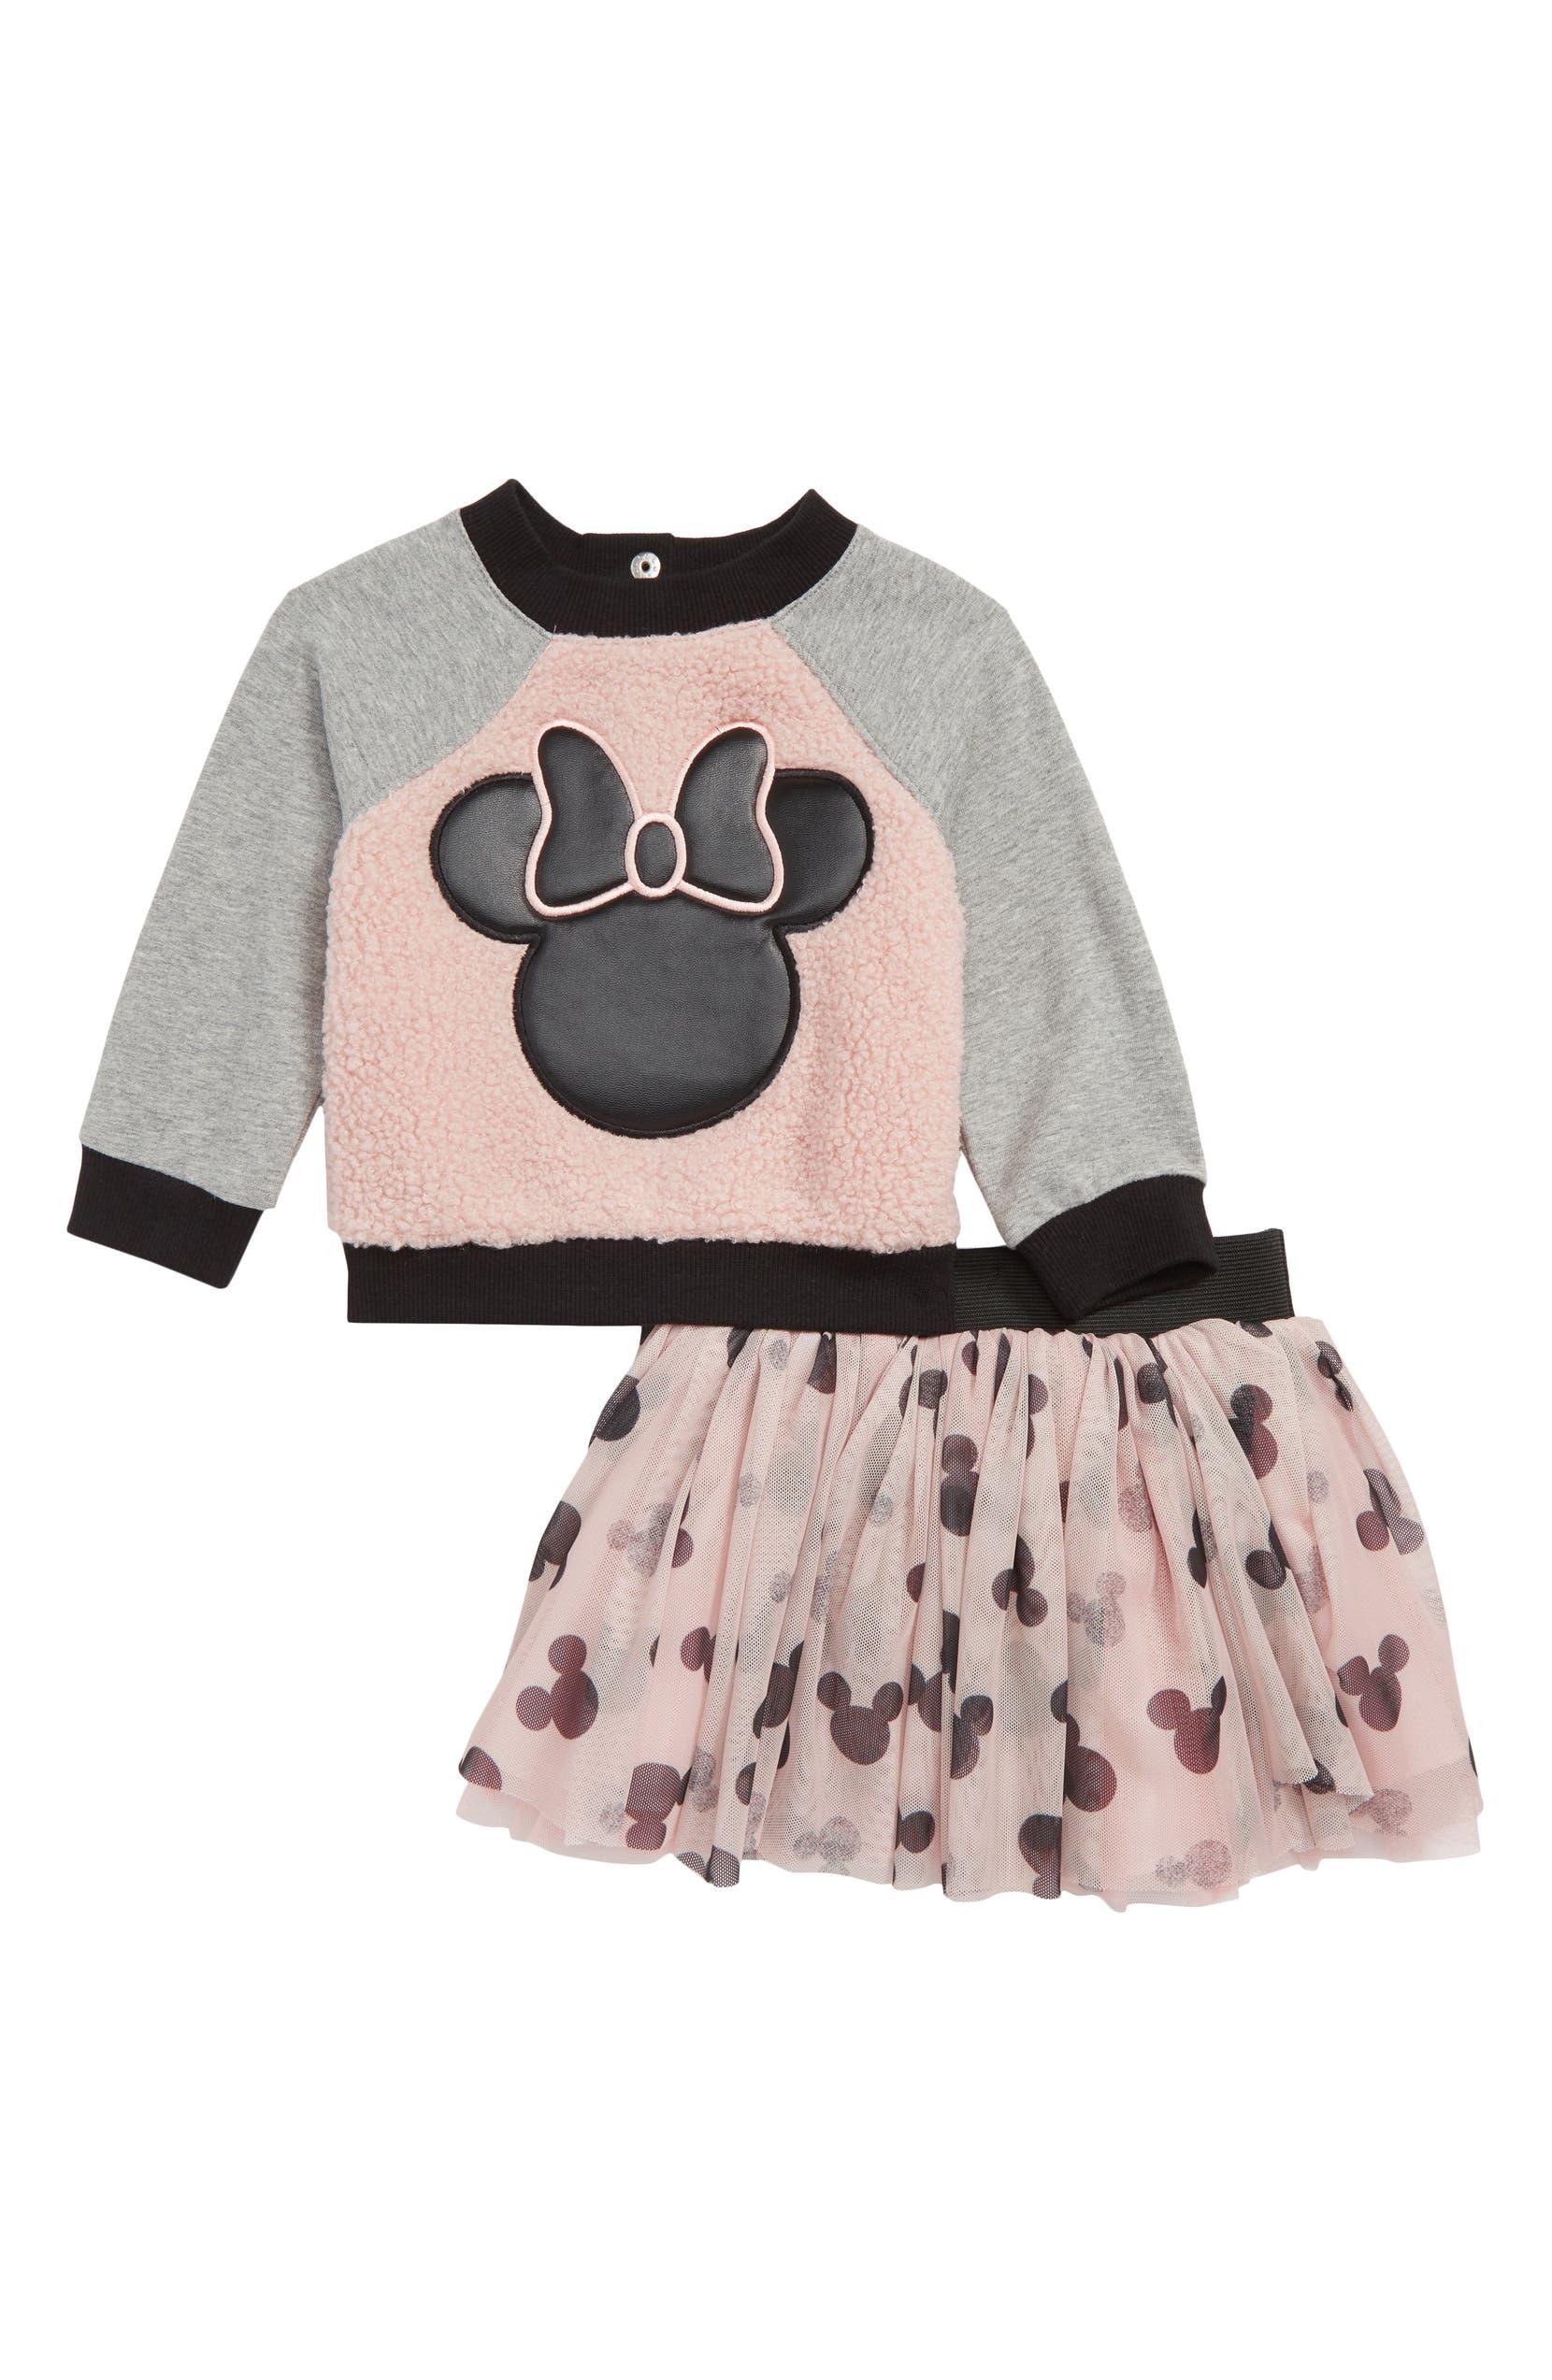 b0e45caa8 Pippa & Julie x Disney Minnie Mouse Pullover & Tutu Skirt Set (Baby Girls)  | Nordstrom